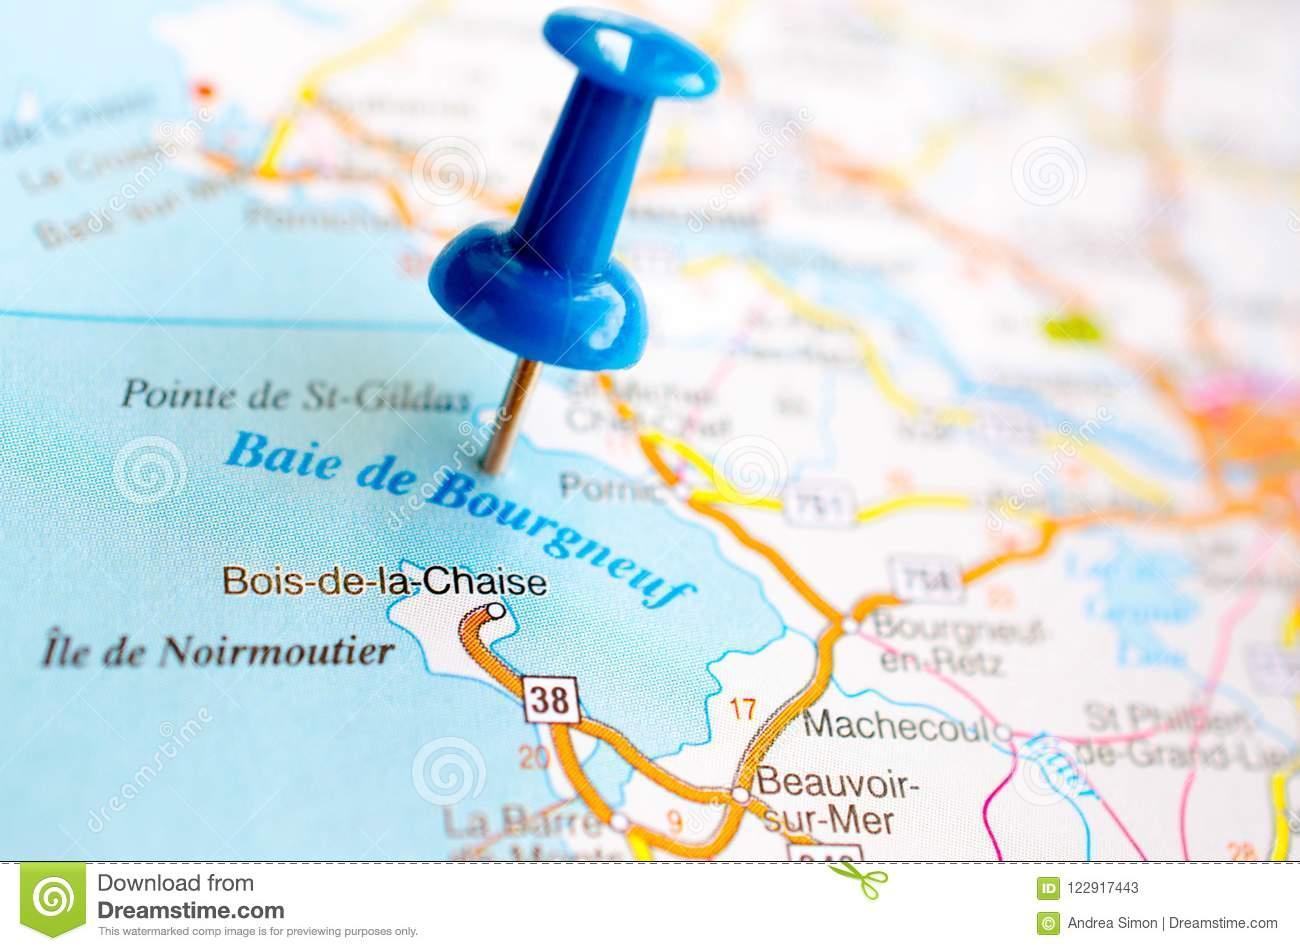 Baie De Bourgneuf On Map Stock Image. Image Of concernant Carte De France Nouvelle Region